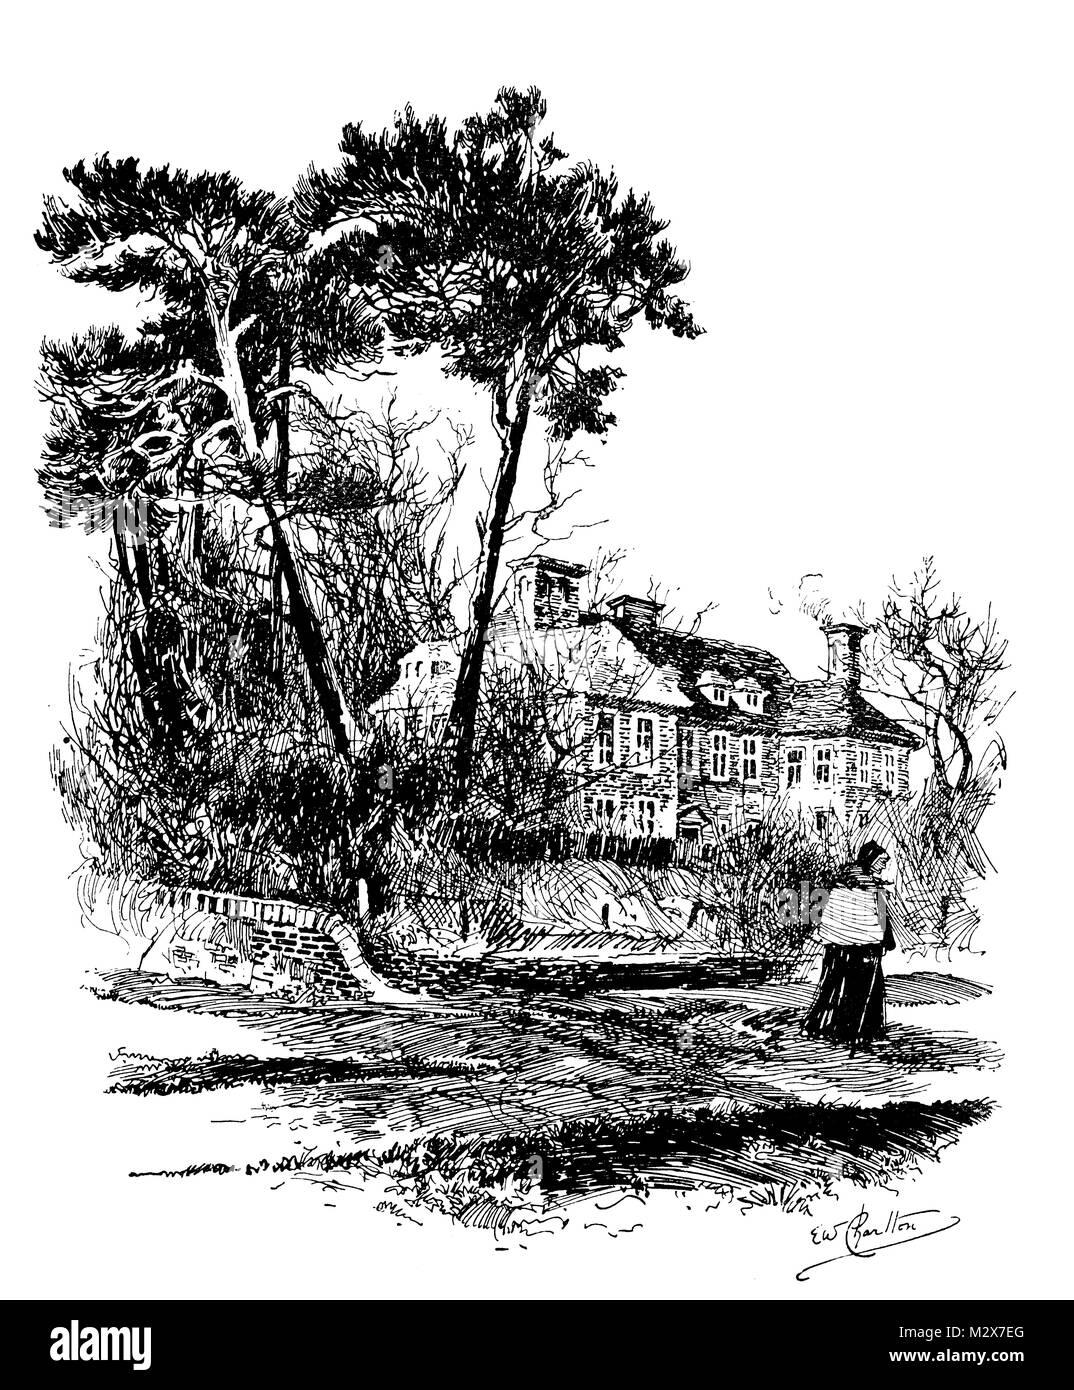 Moyles Court, Ringwood, line illustration by Edward William Charlton from 1895 The Studio an Illustrated Magazine - Stock Image